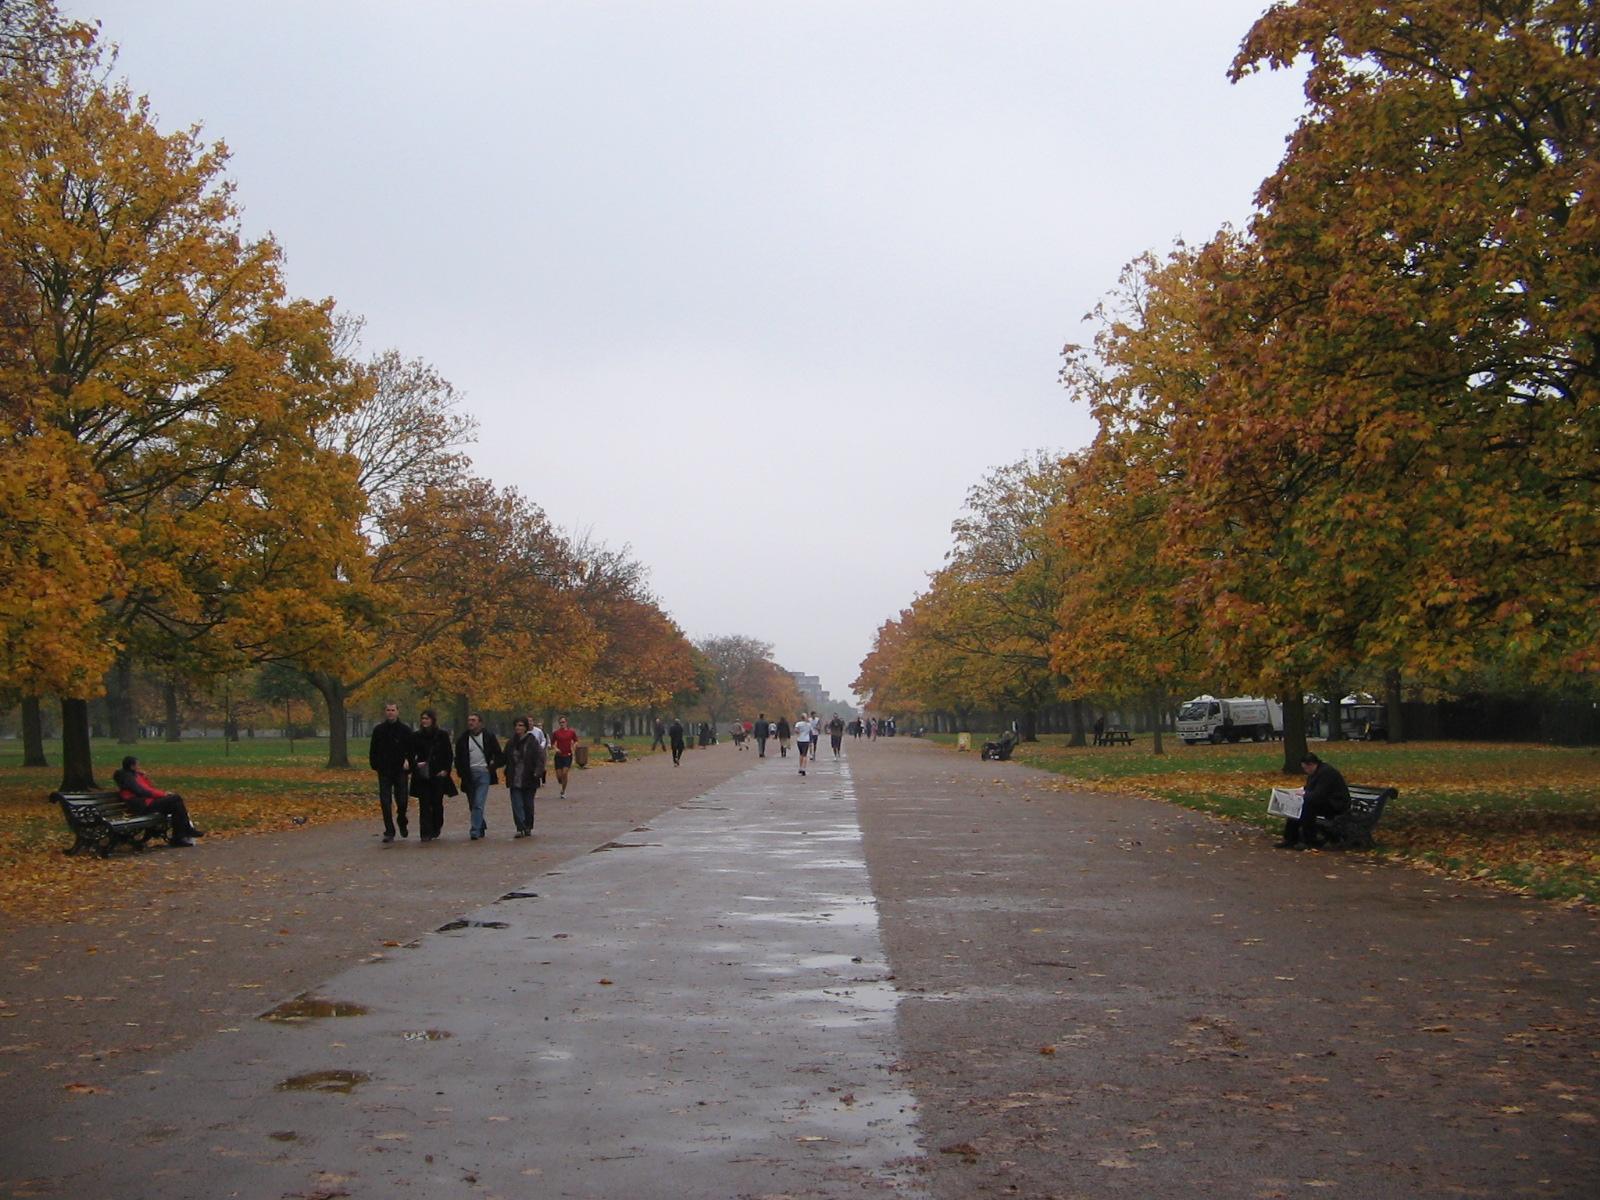 Kensington park rowan trumpet prof blog for Kensington park